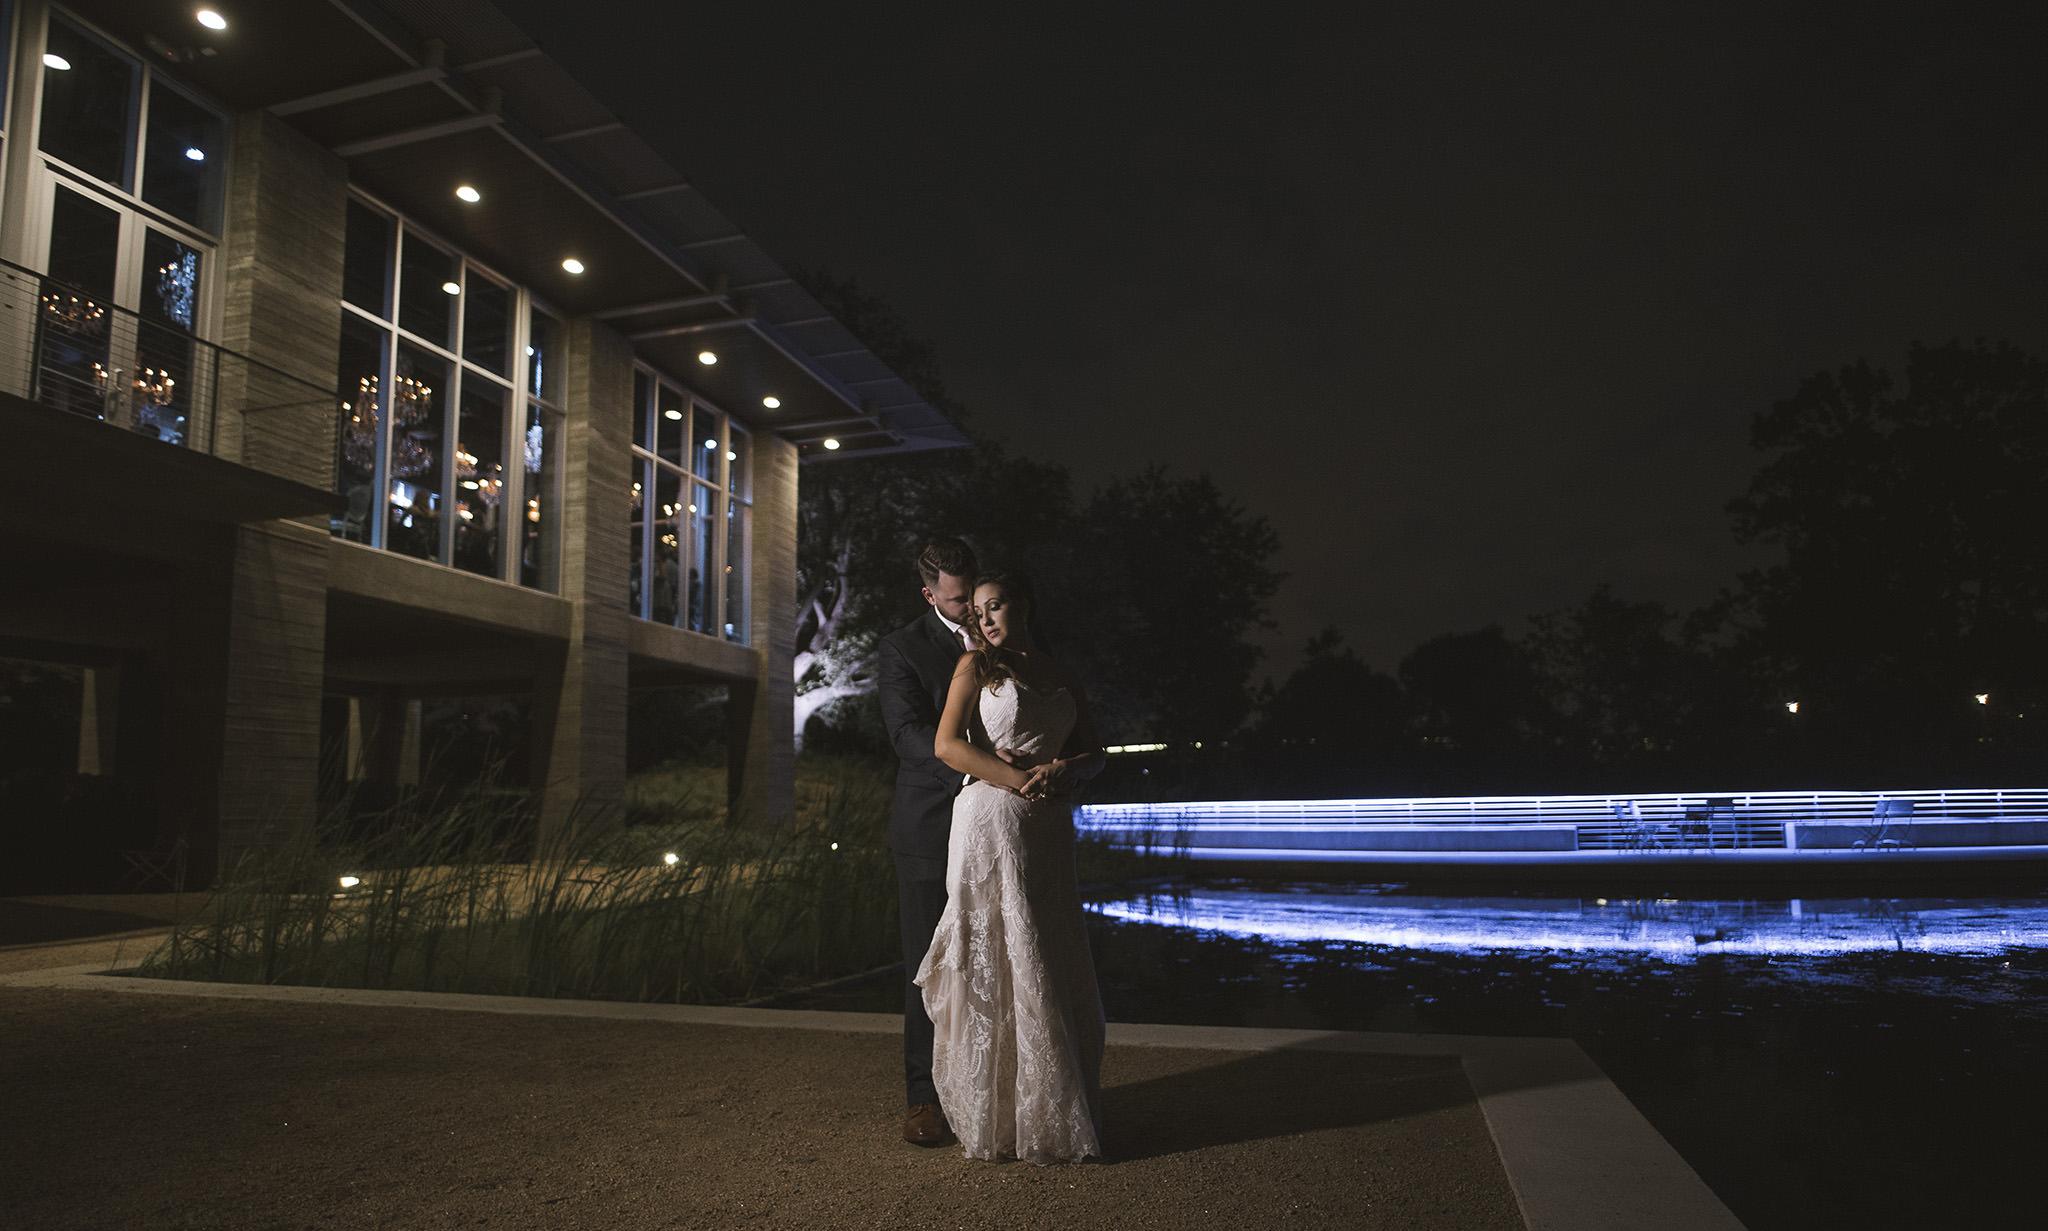 Dunlavy-wedding-venue-houston-texas-photographer